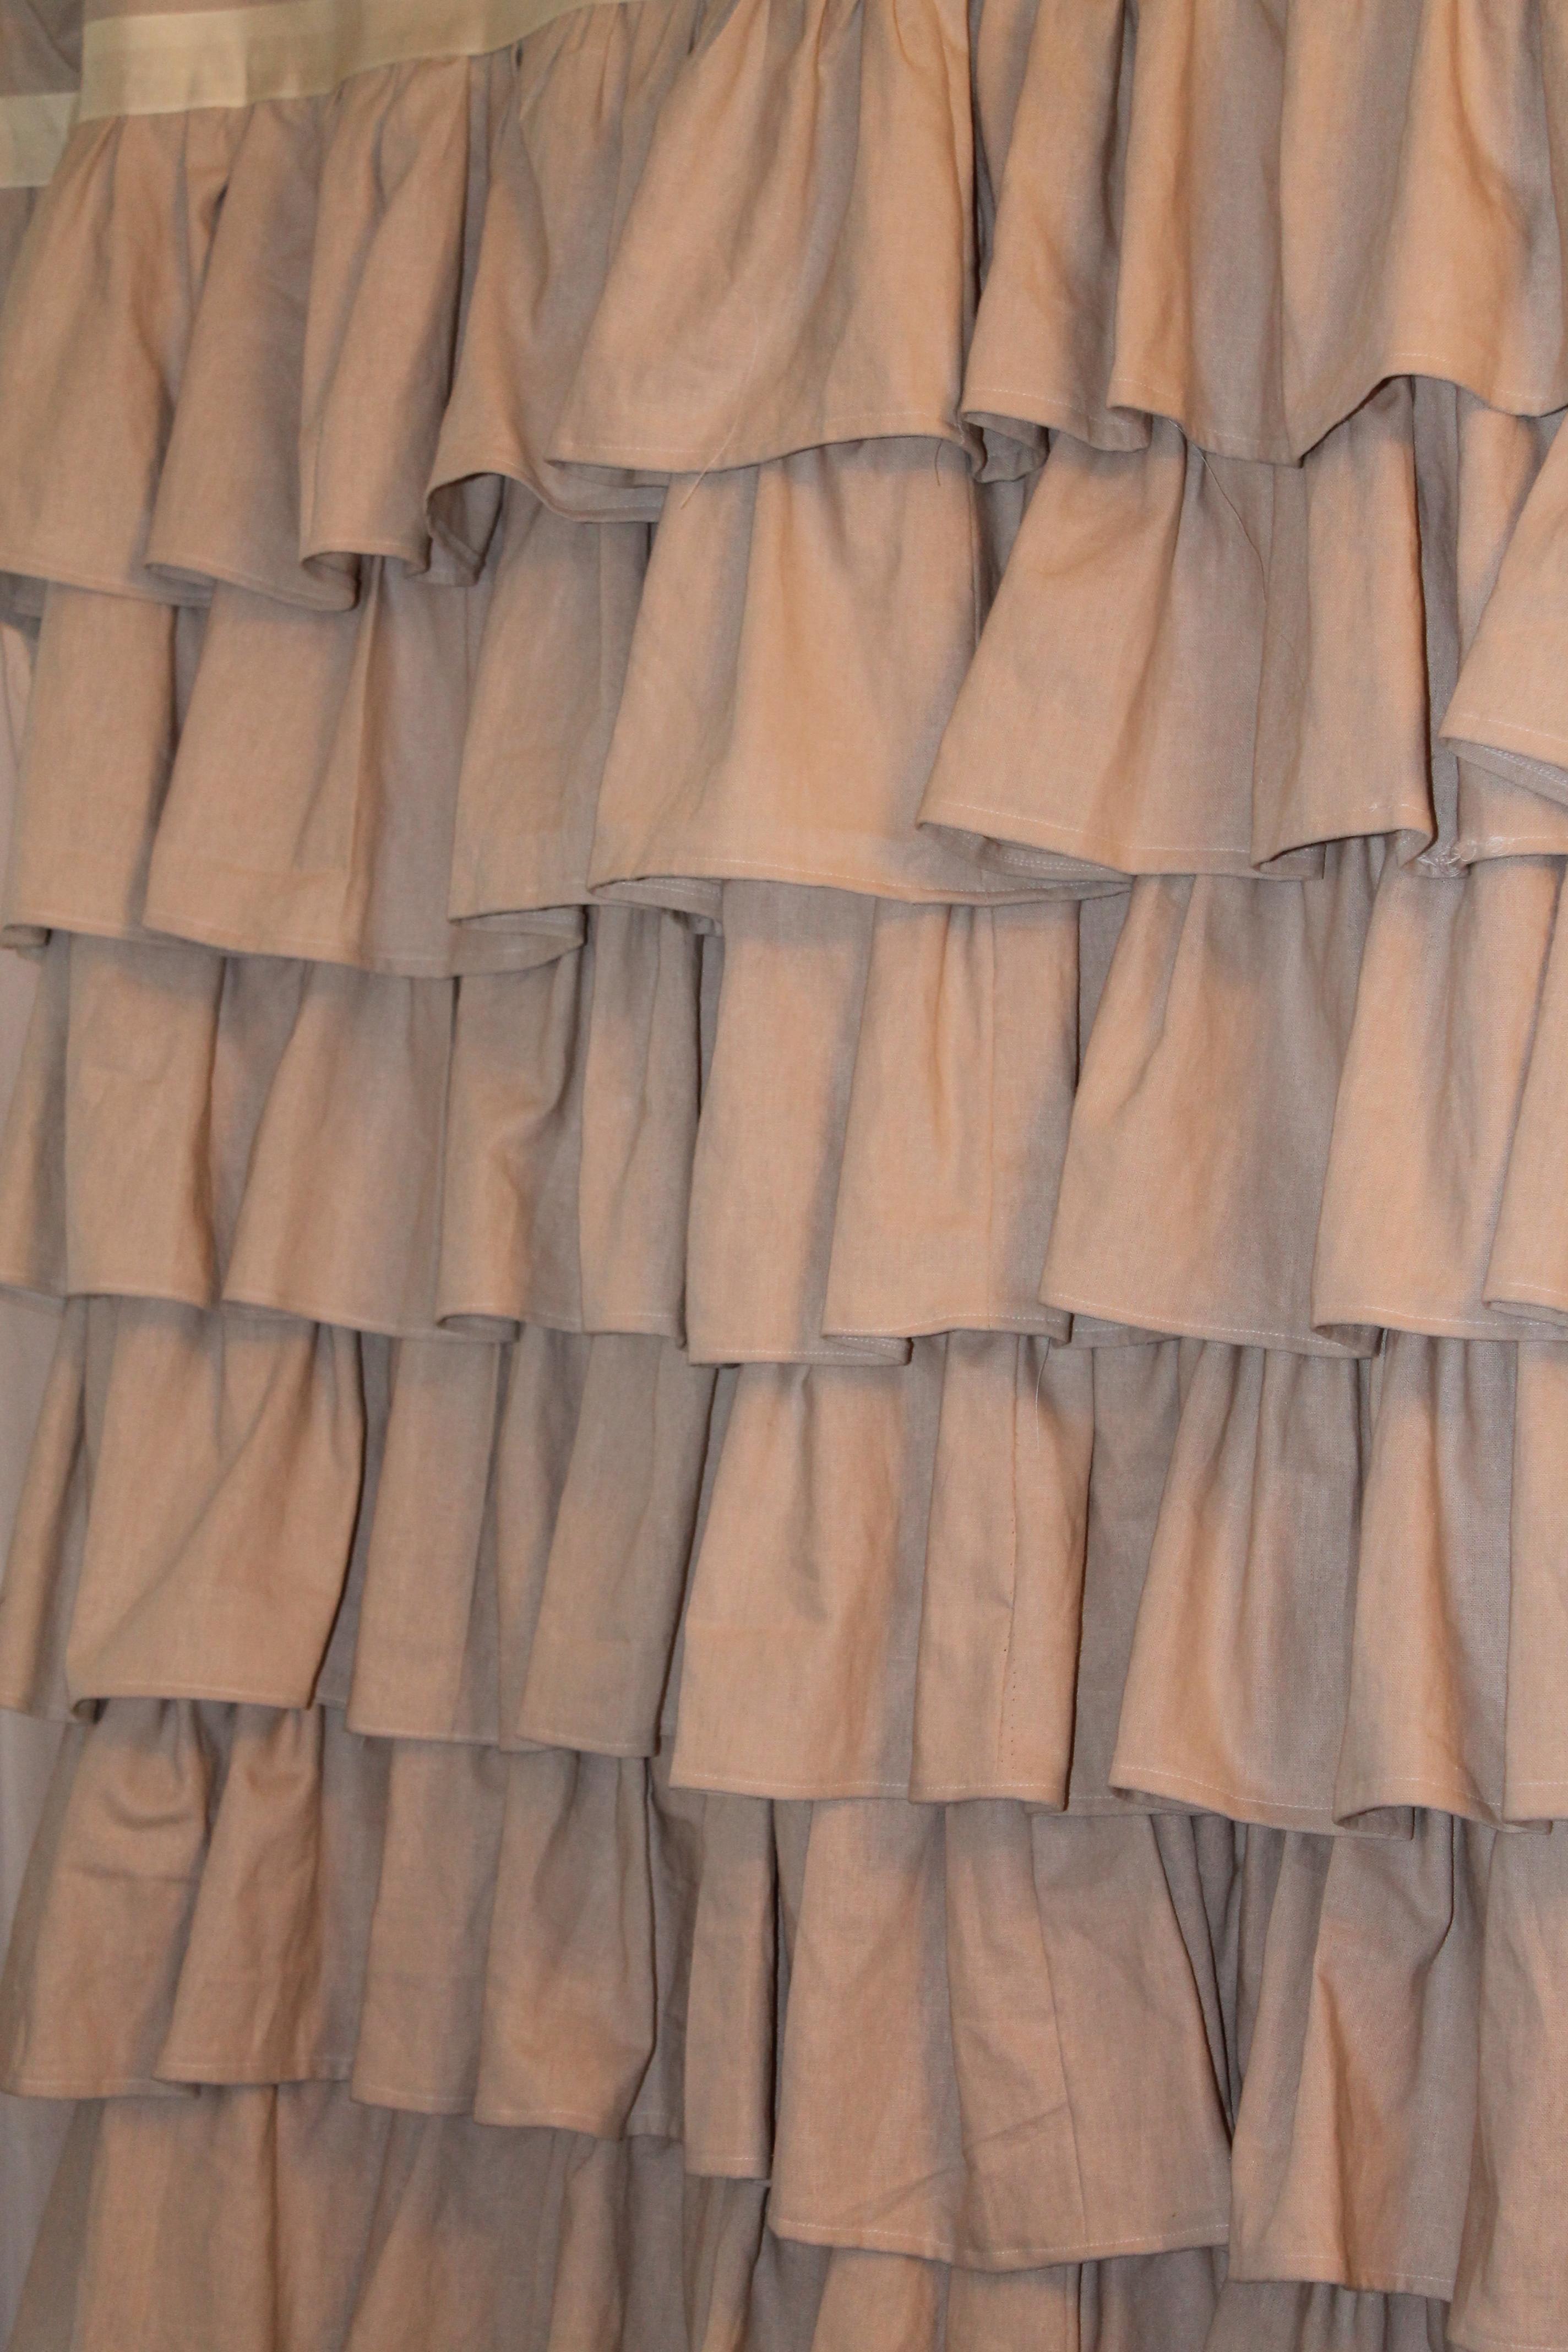 Farmhouse Shower Curtain Best 25 Shower Curtain Rods Ideas On Pinterest Farmhouse Shower Burlap